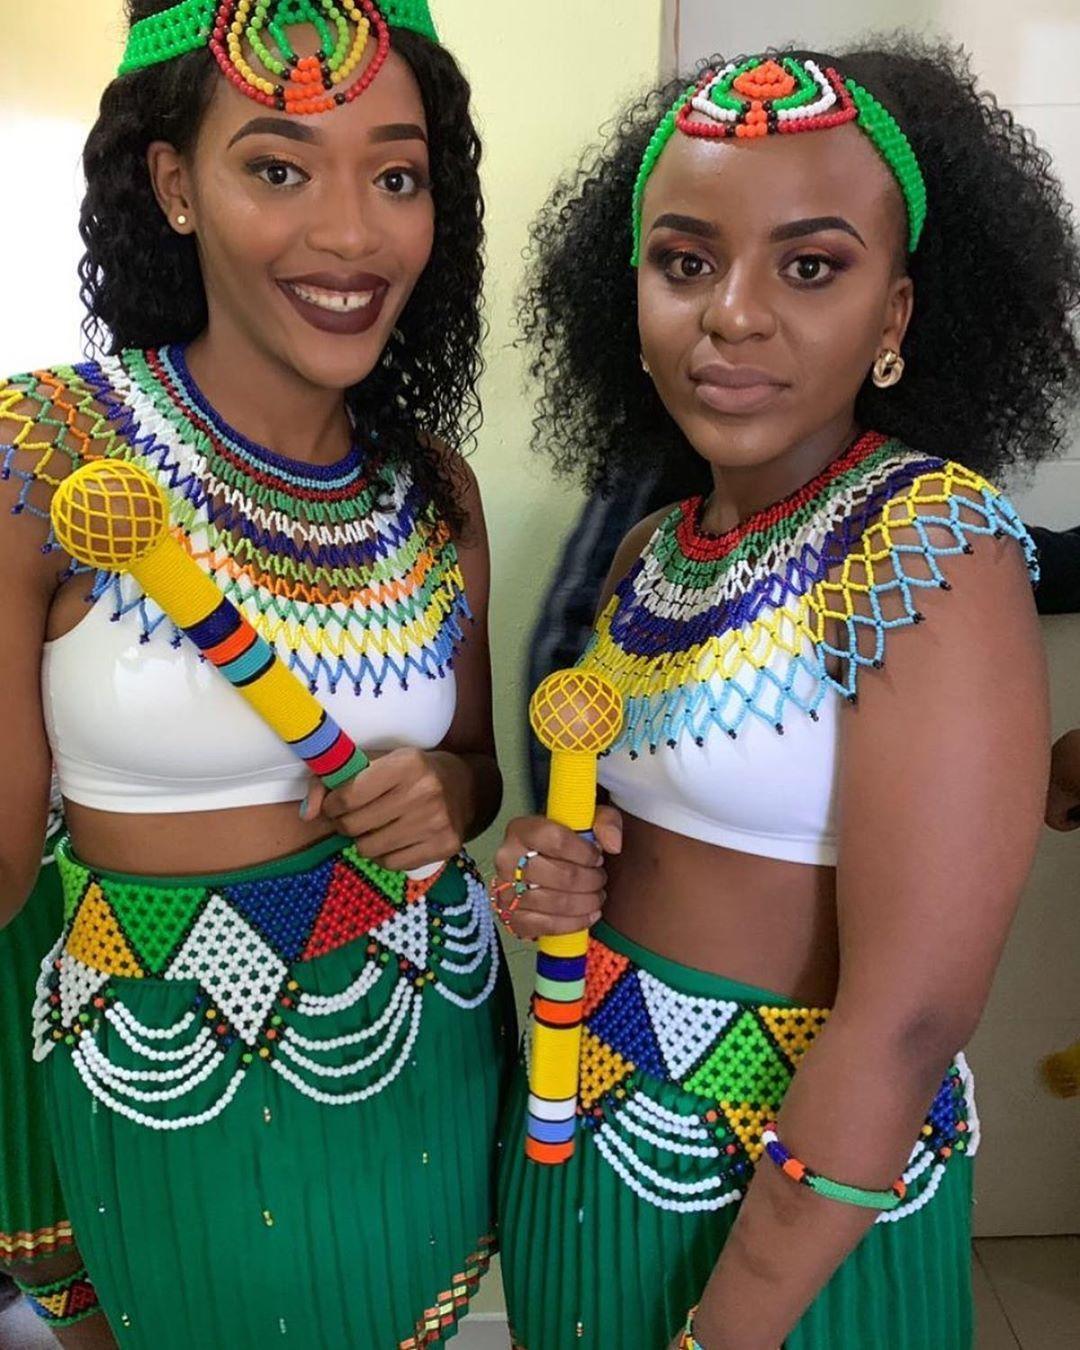 Modern Zulu Bride And Groom.   African clothing, African